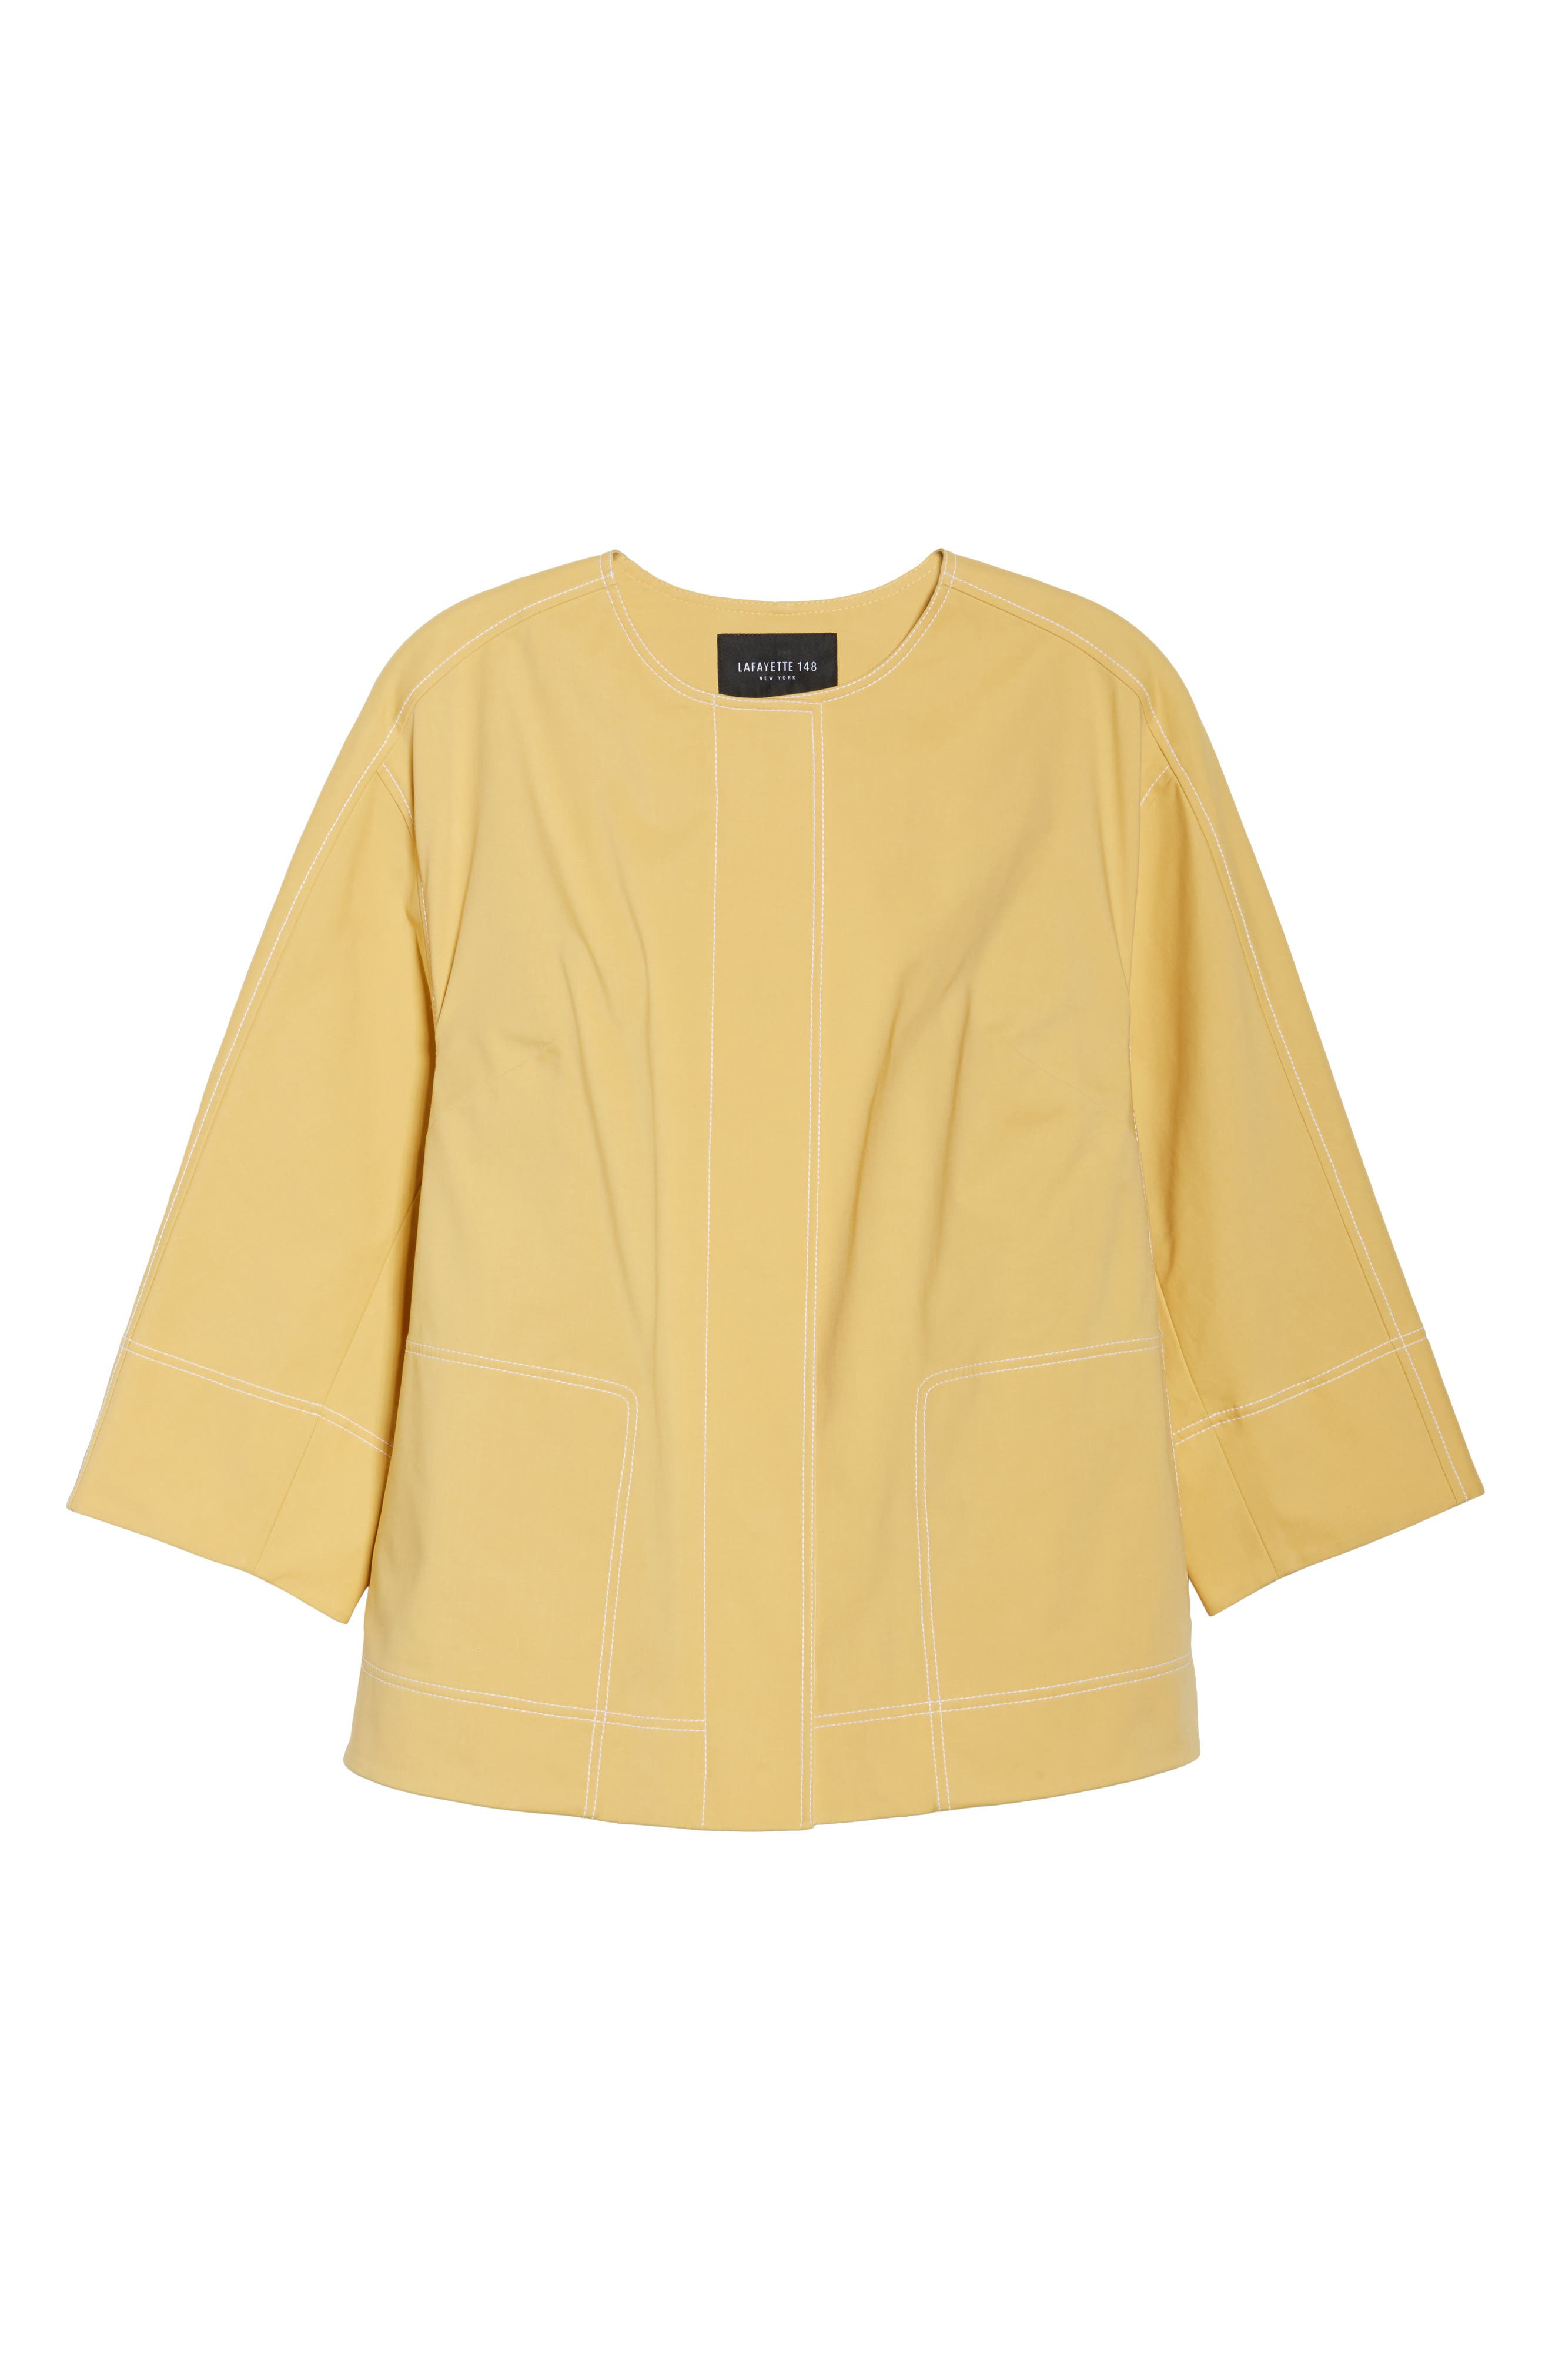 Milo Zip Jacket,                             Alternate thumbnail 6, color,                             Sienna Yellow